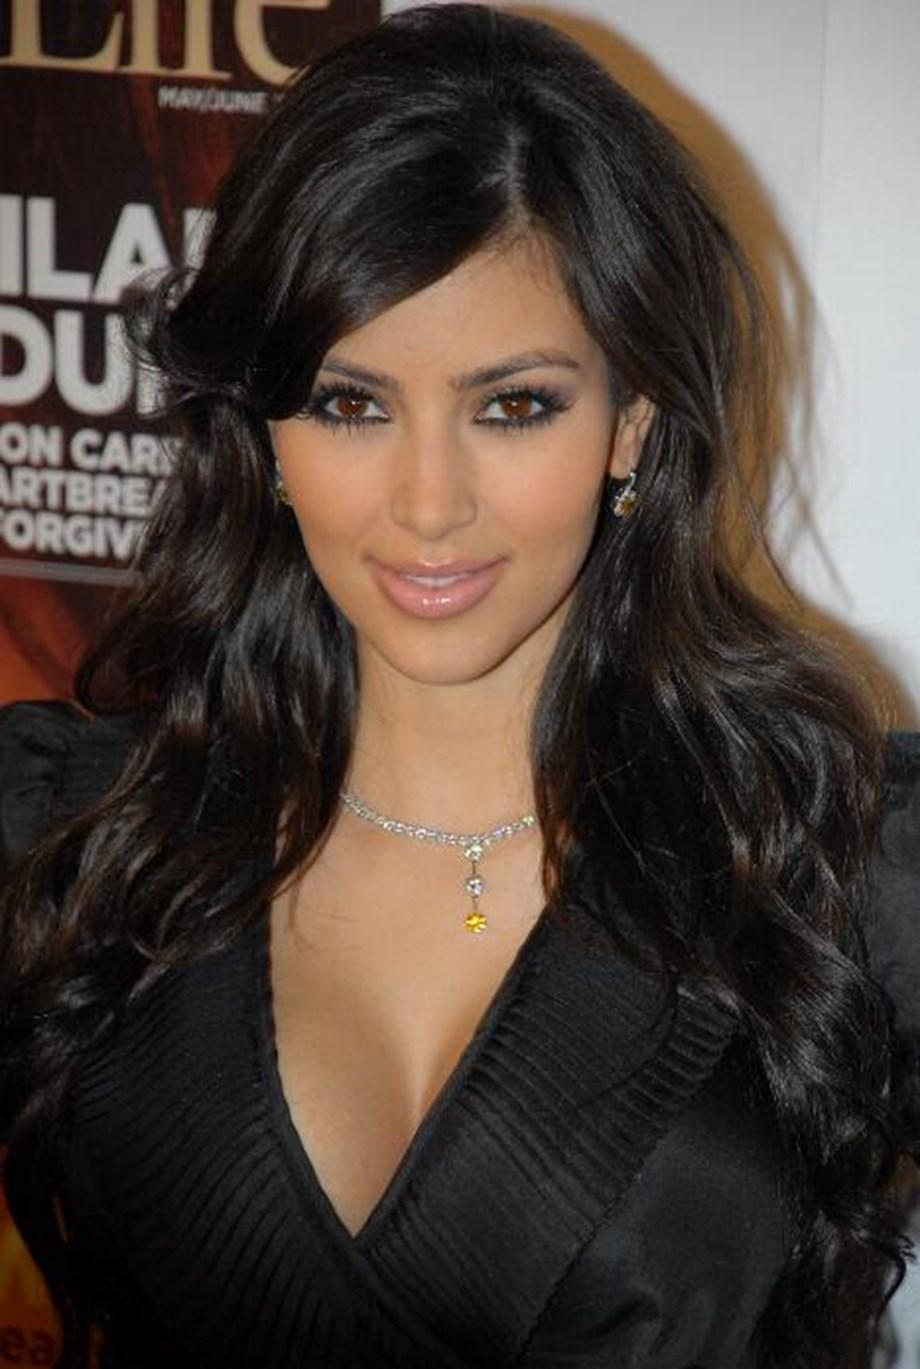 Kim Kardashian West visits White House to help ex-inmates get jobs